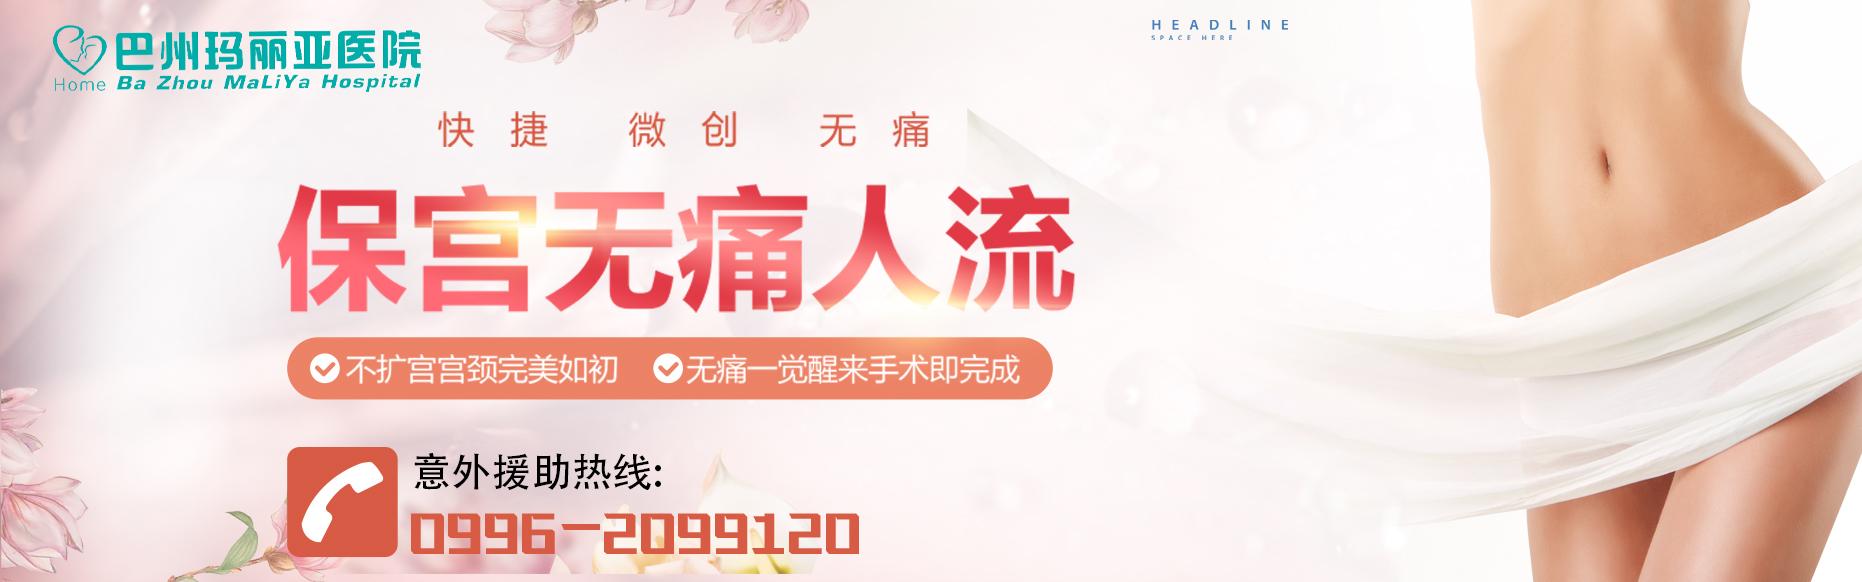 http://bazhoumly.com/data/upload/202101/20210104163217_881.jpg